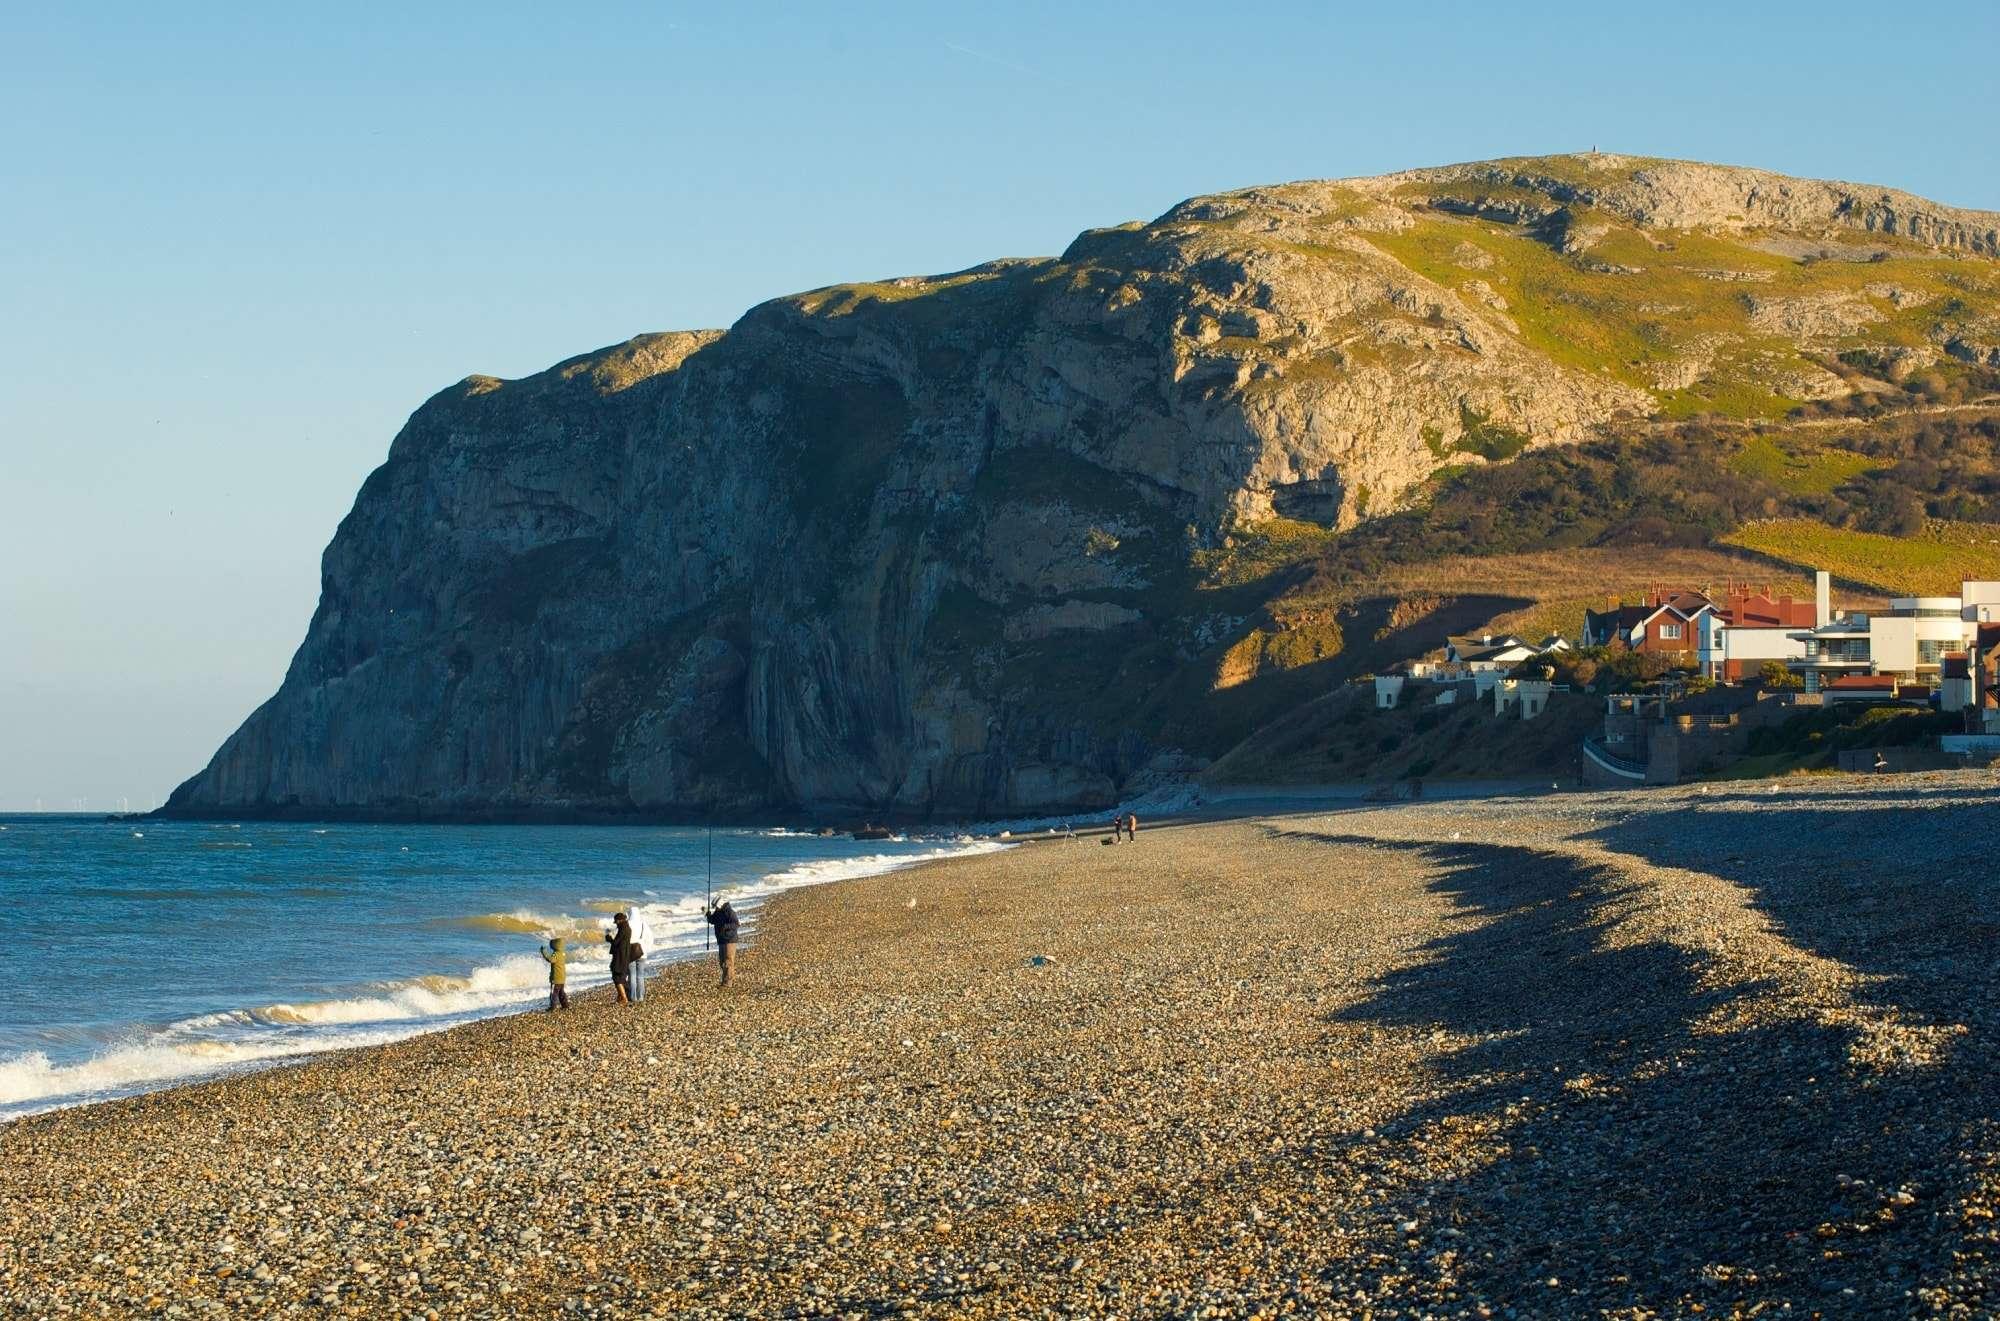 coast - photo #32